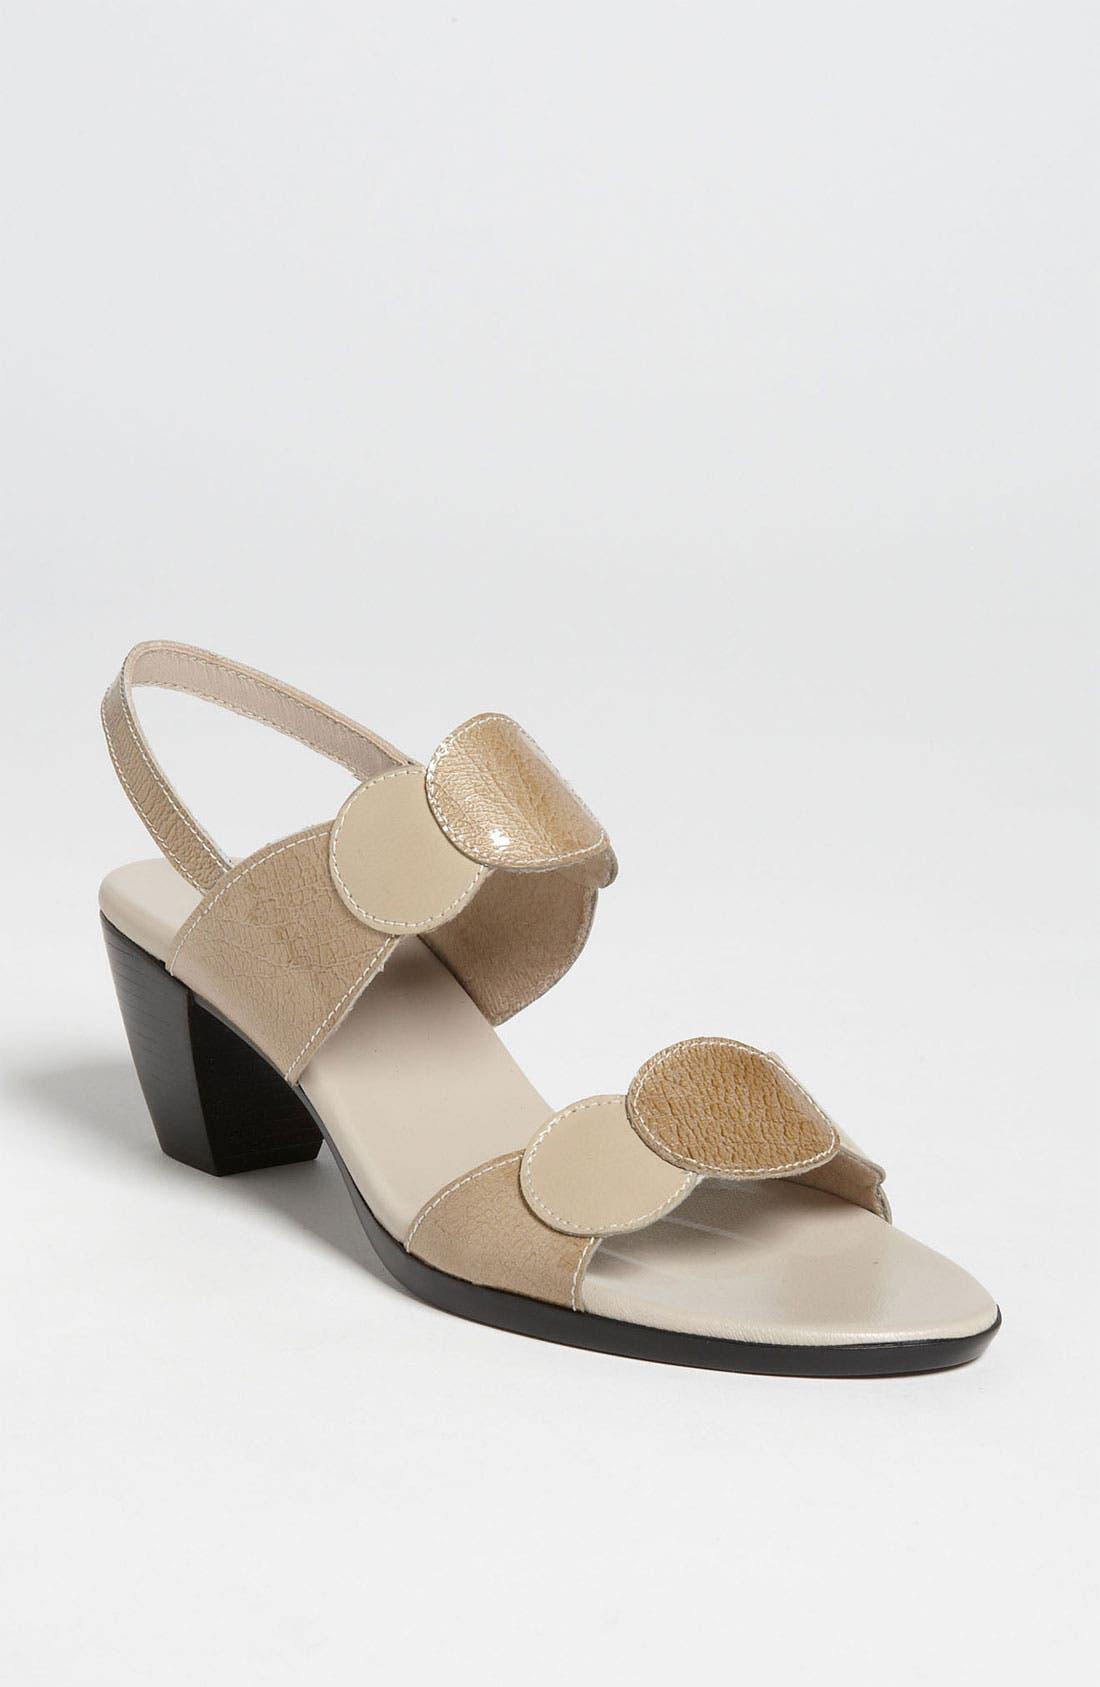 Alternate Image 1 Selected - Munro 'Solar' Sandal